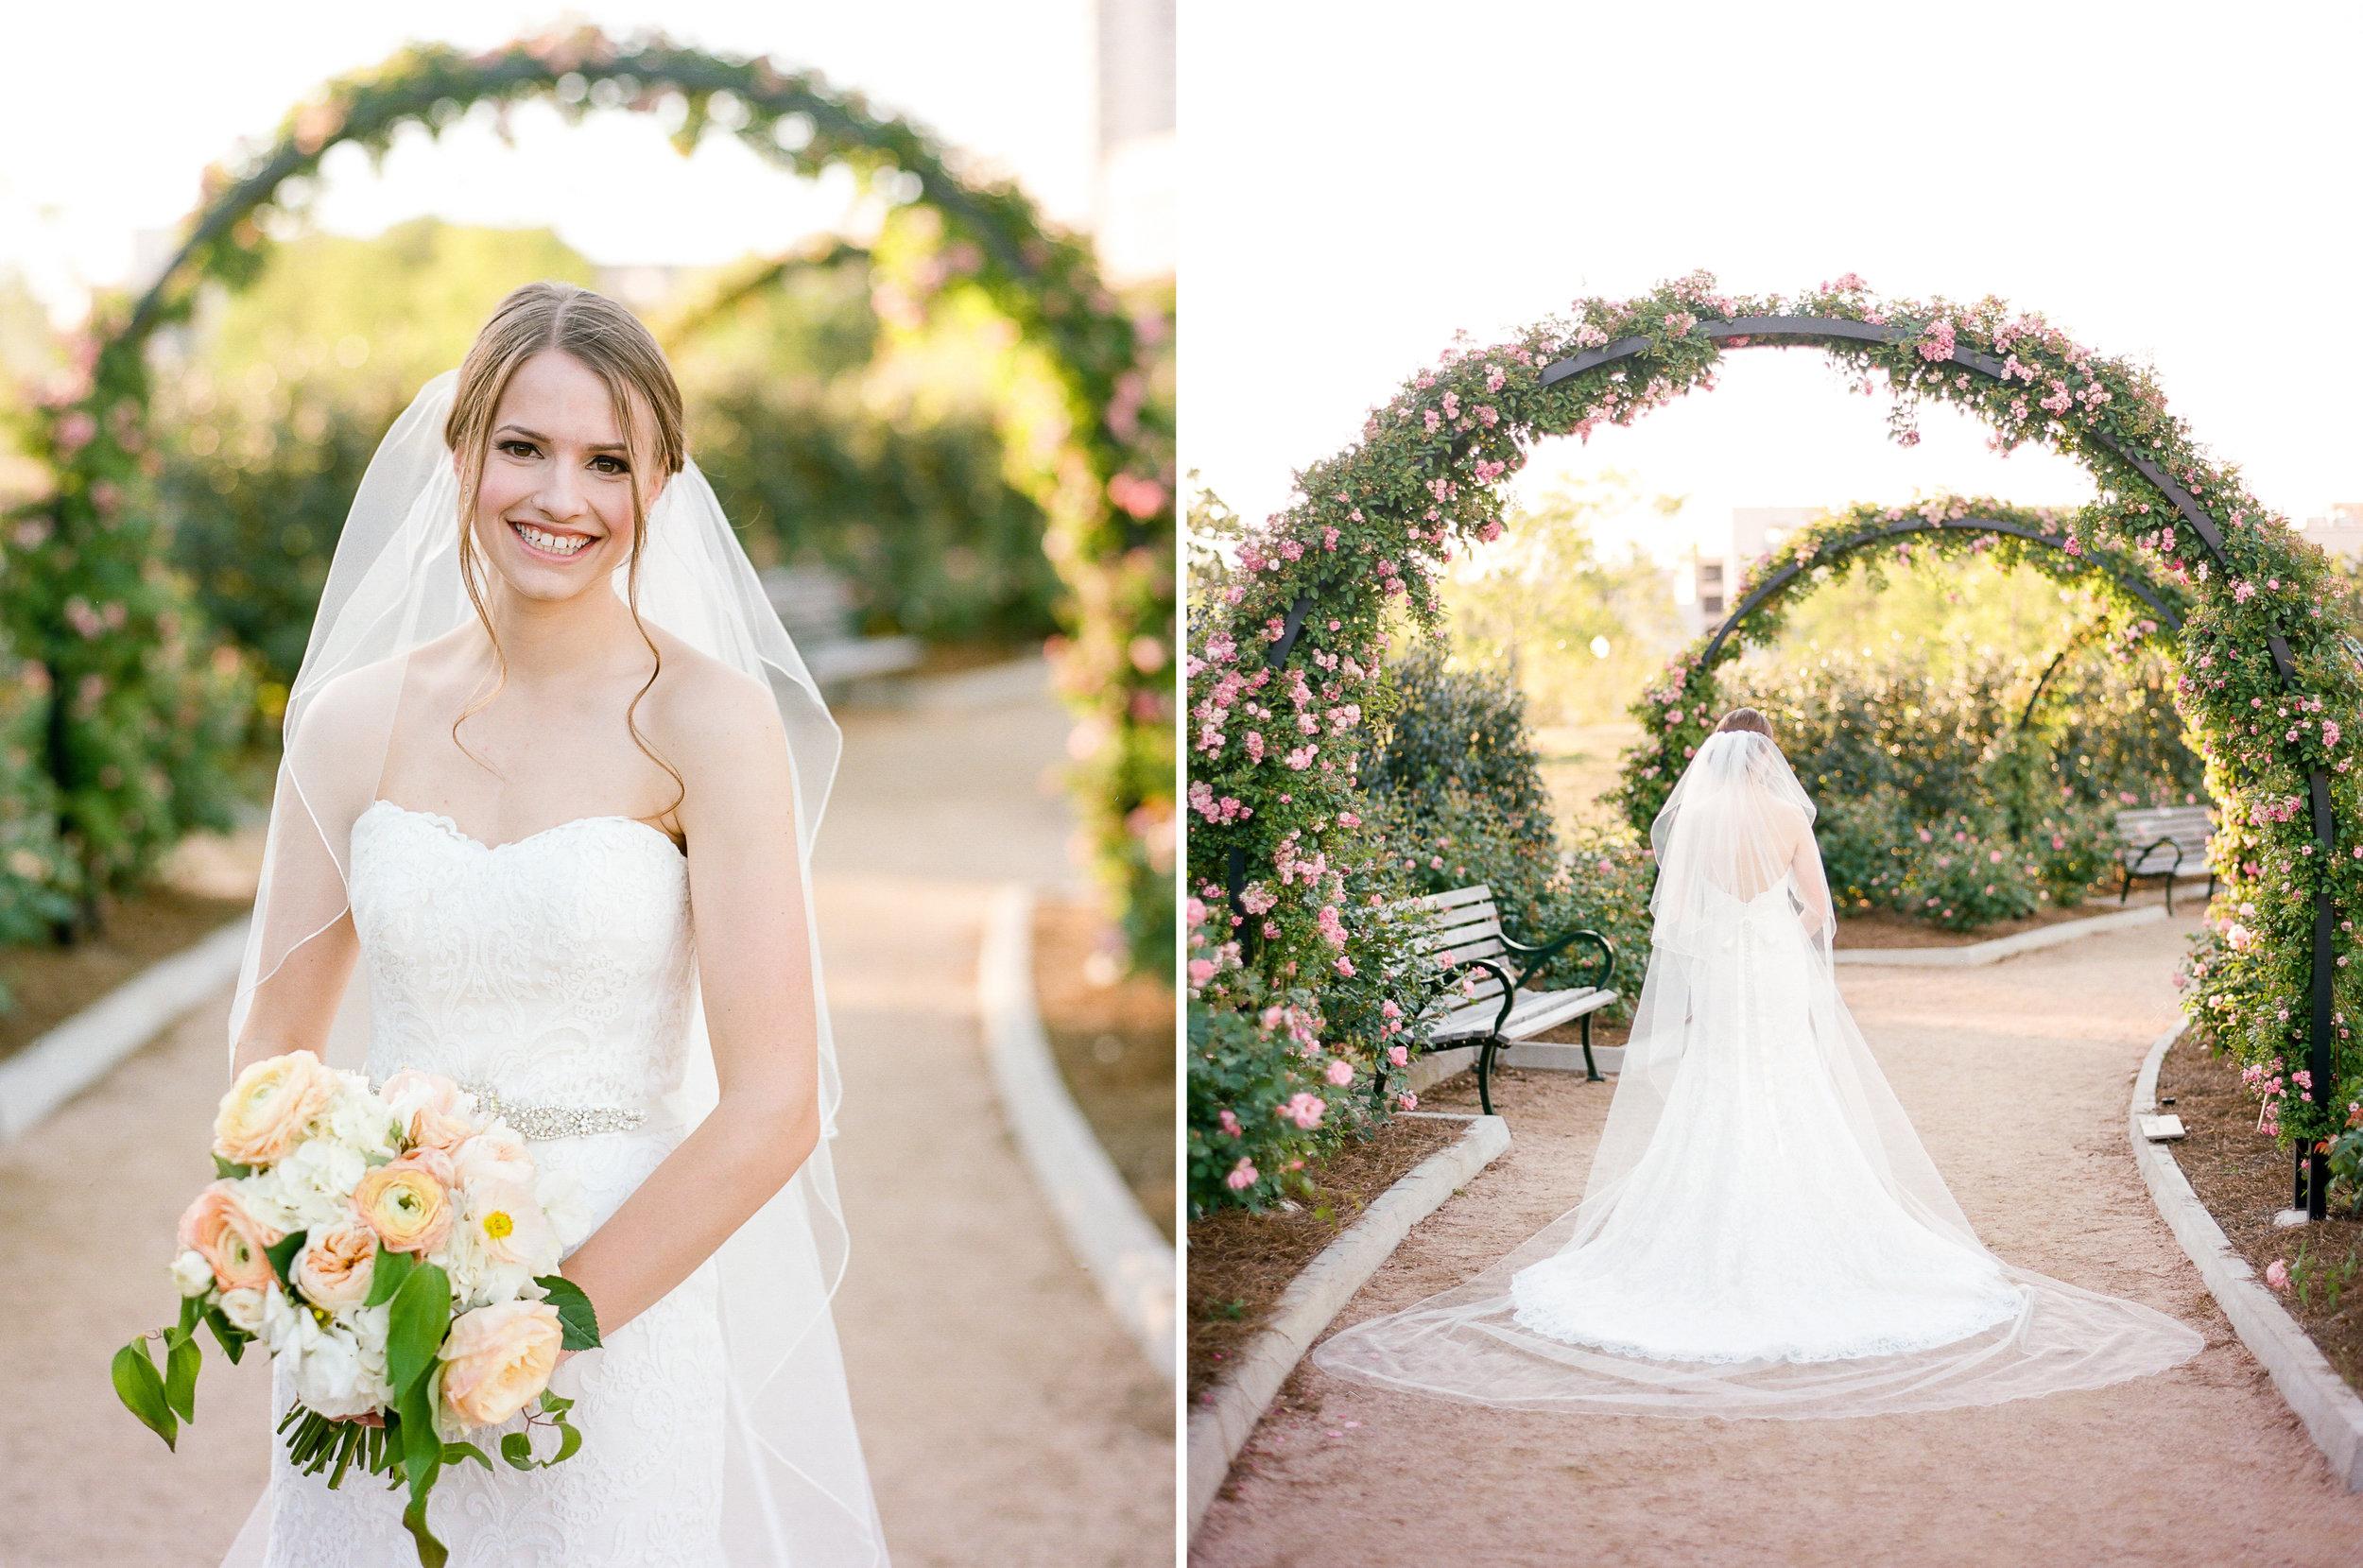 Houston-Wedding-Photographer-Film-Fine-Art-Bridals-Dana Fernandez-Photography-110.jpg